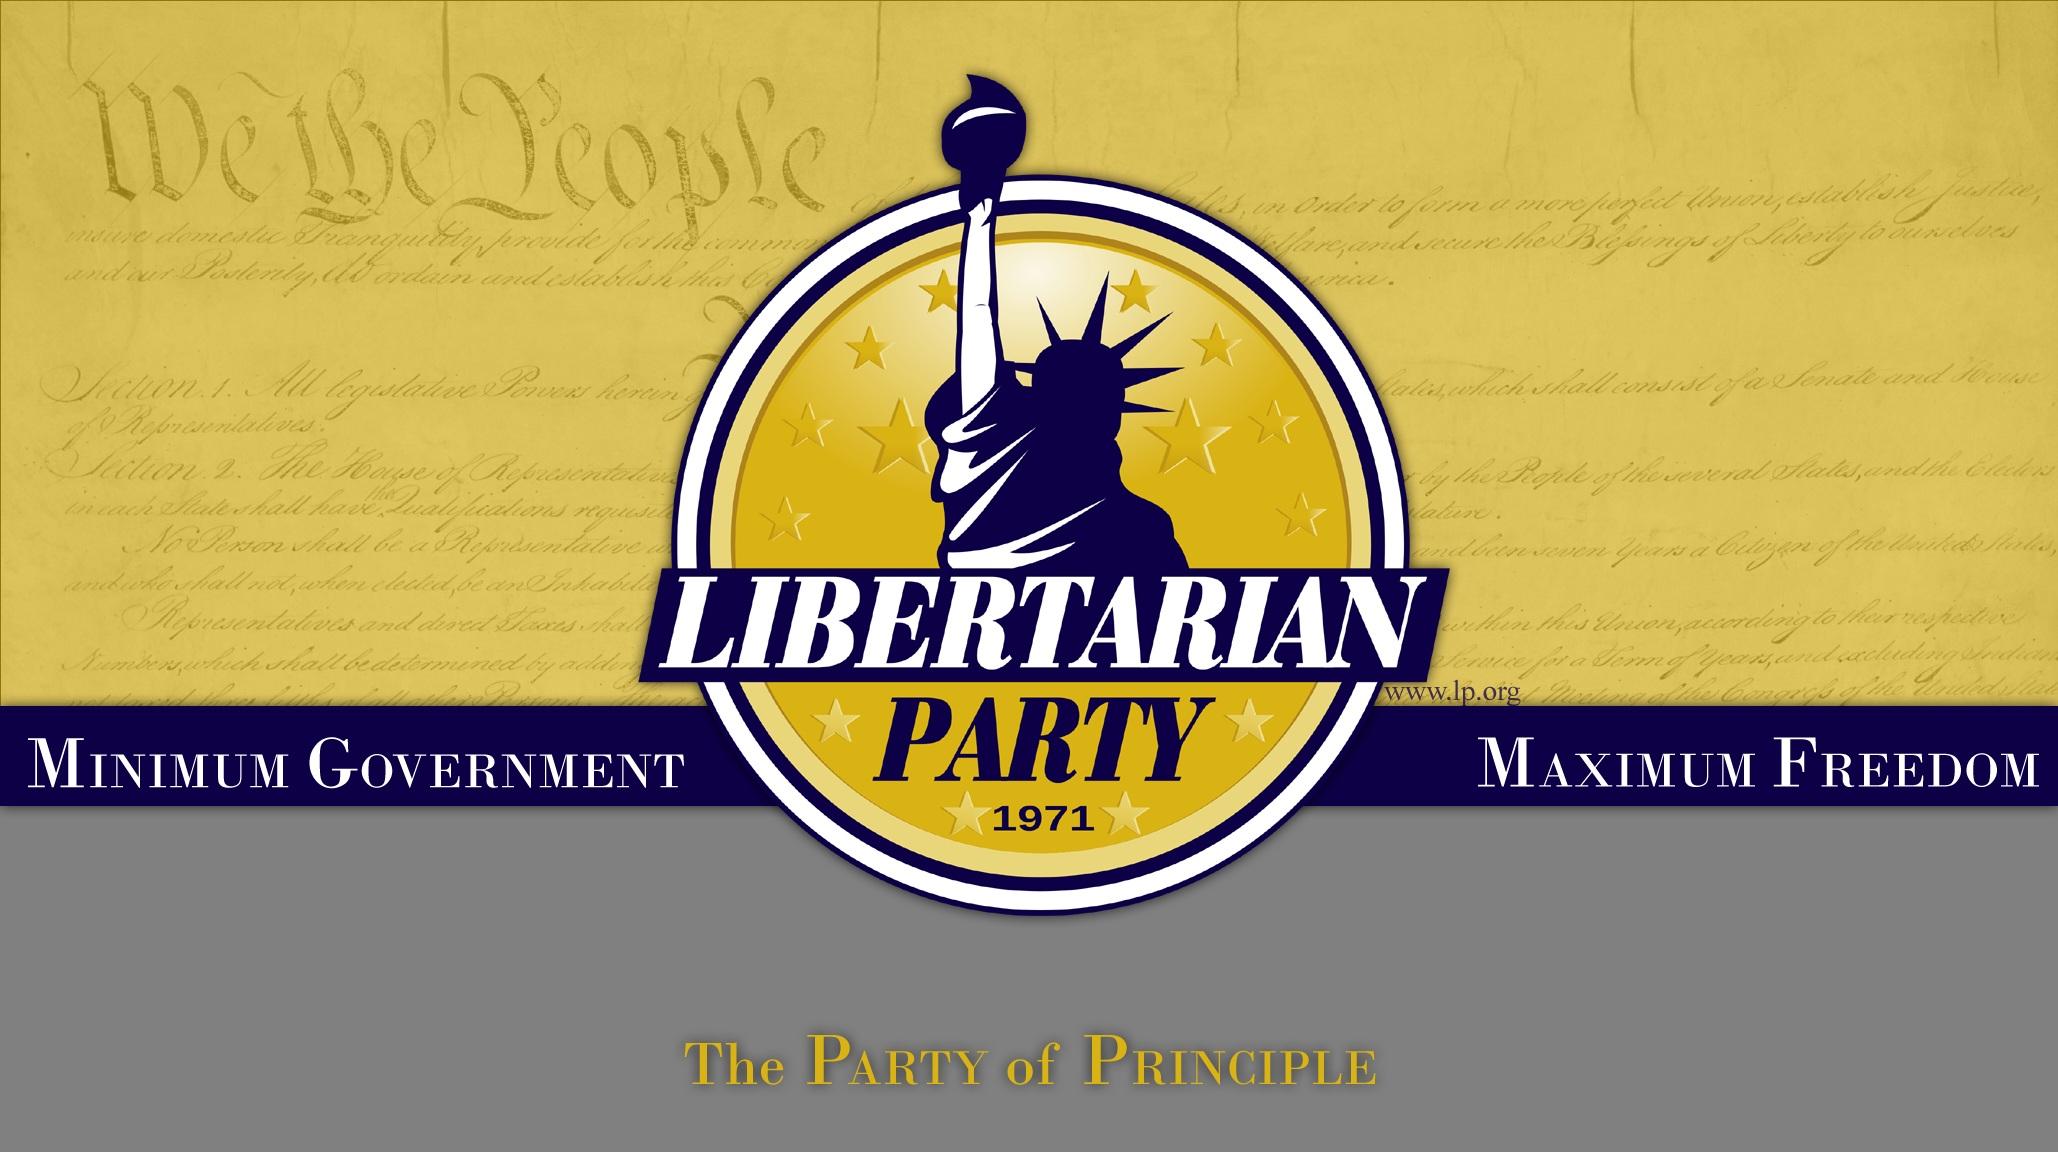 Libertarian Party Debate Winners and Losers